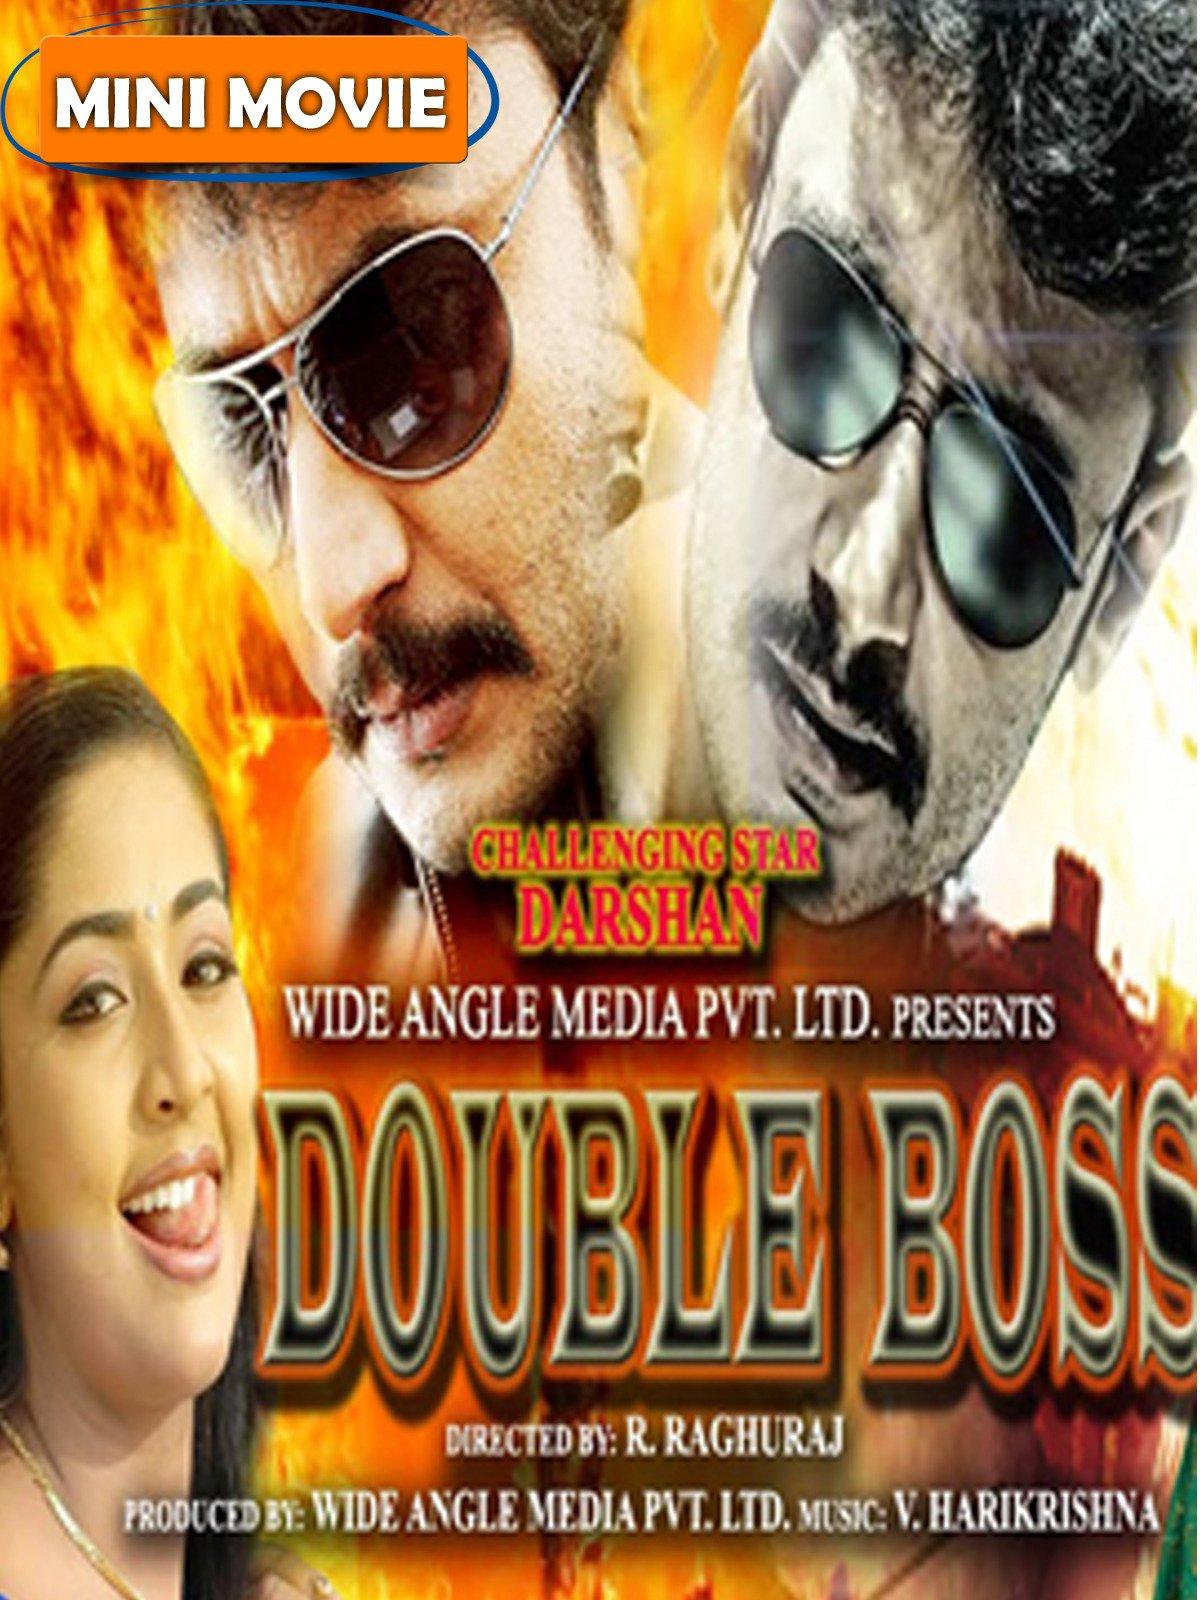 Double Boss -Mini